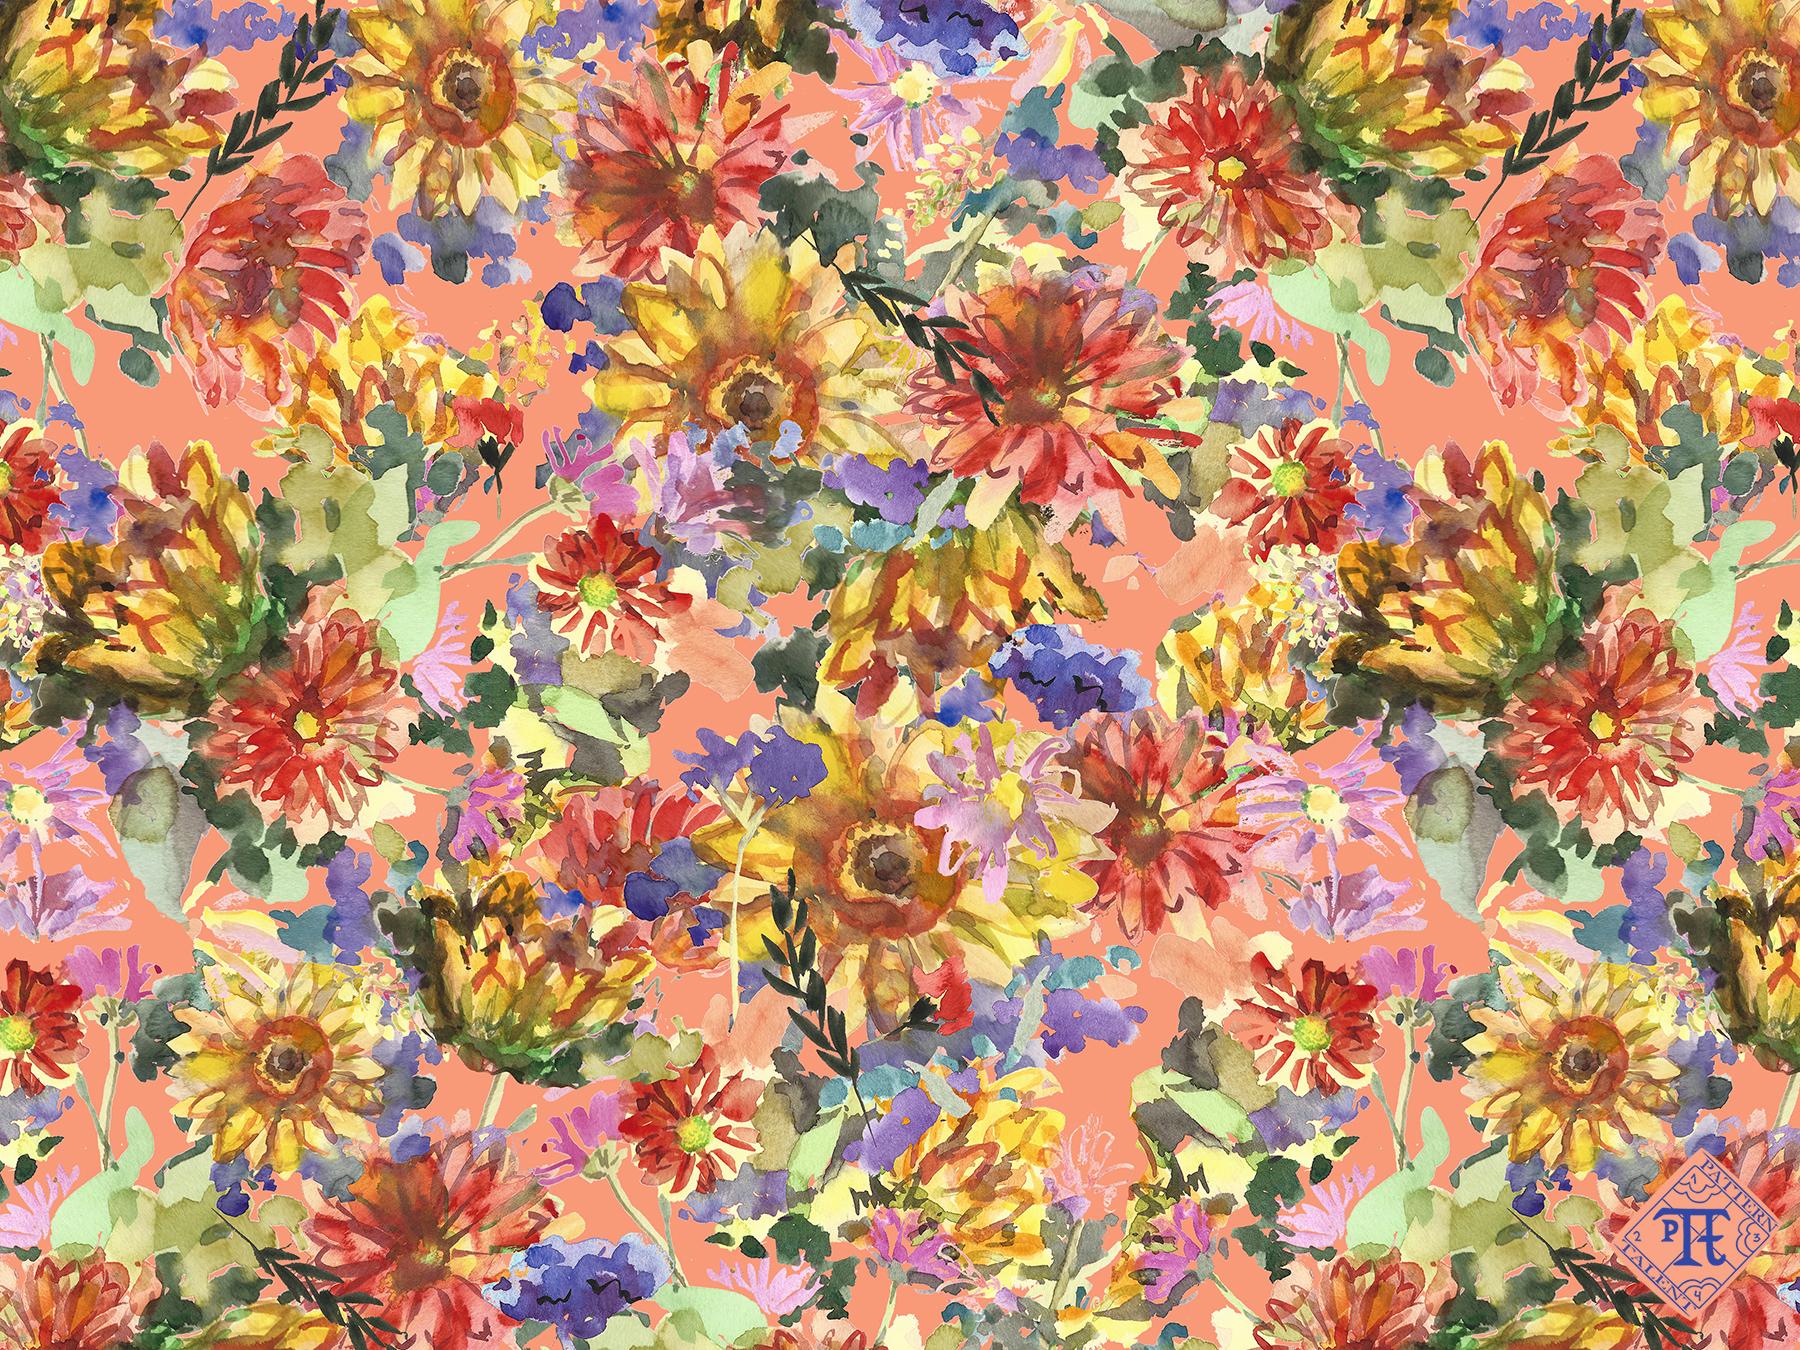 Floral pattern peach